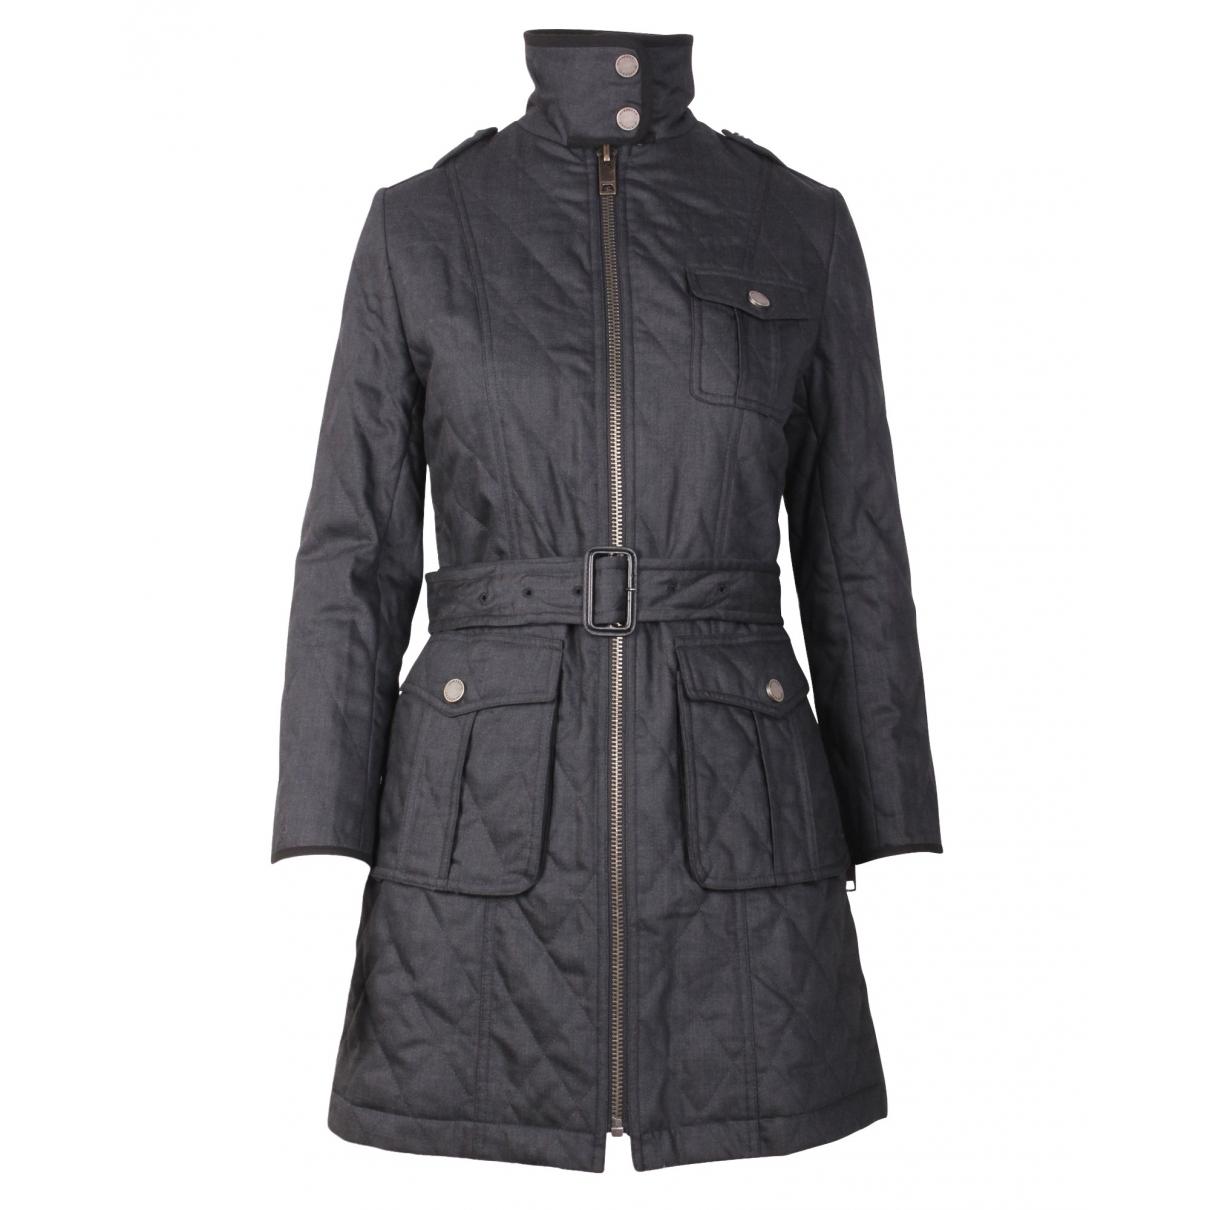 Burberry \N Grey coat for Women 36 FR